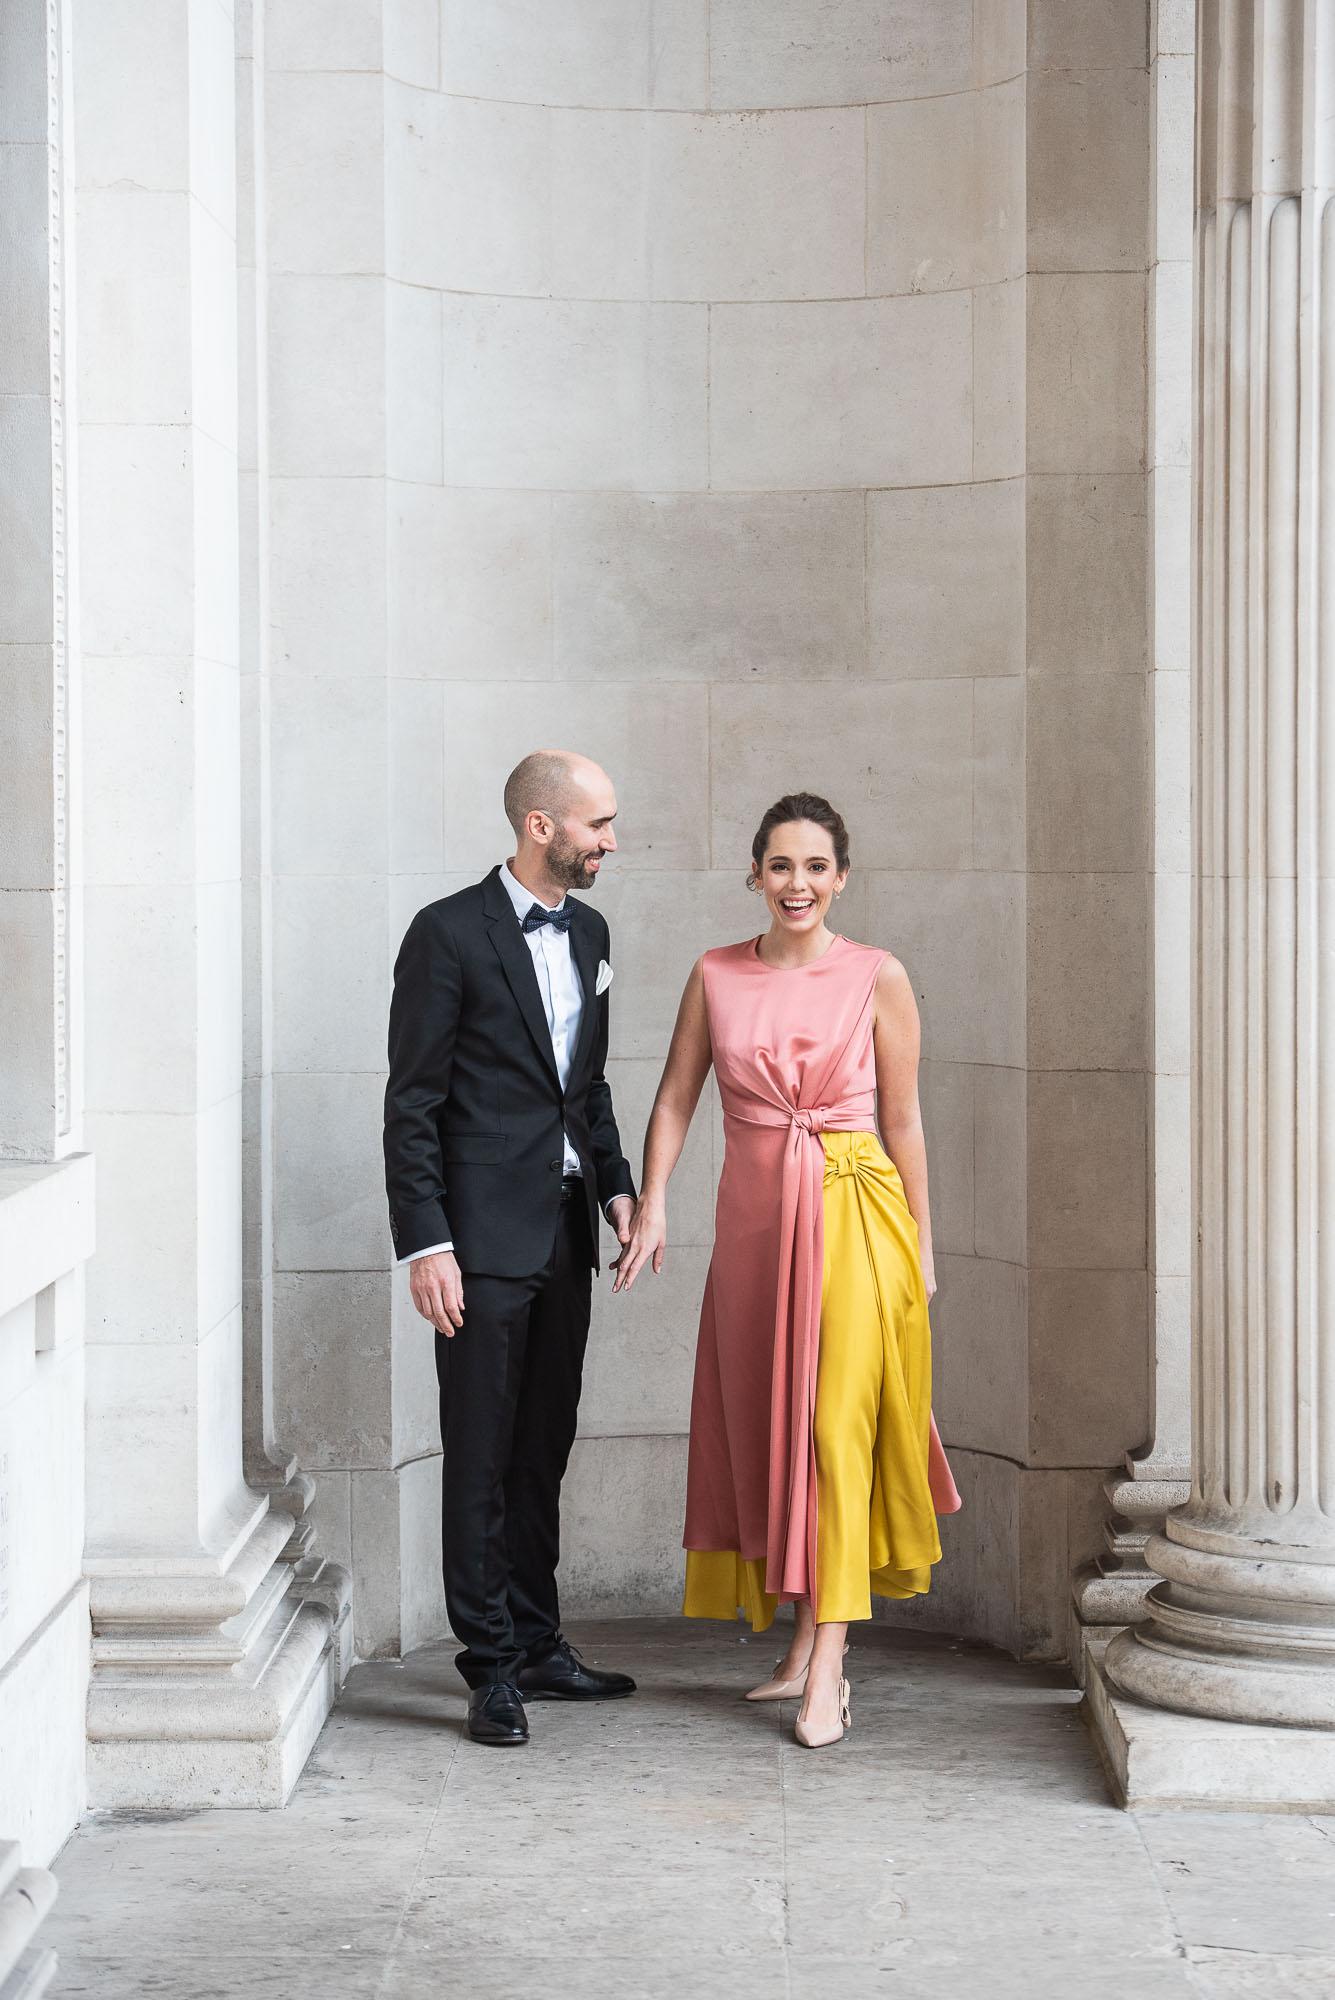 Our Wedding_HR (23 of 176).jpg